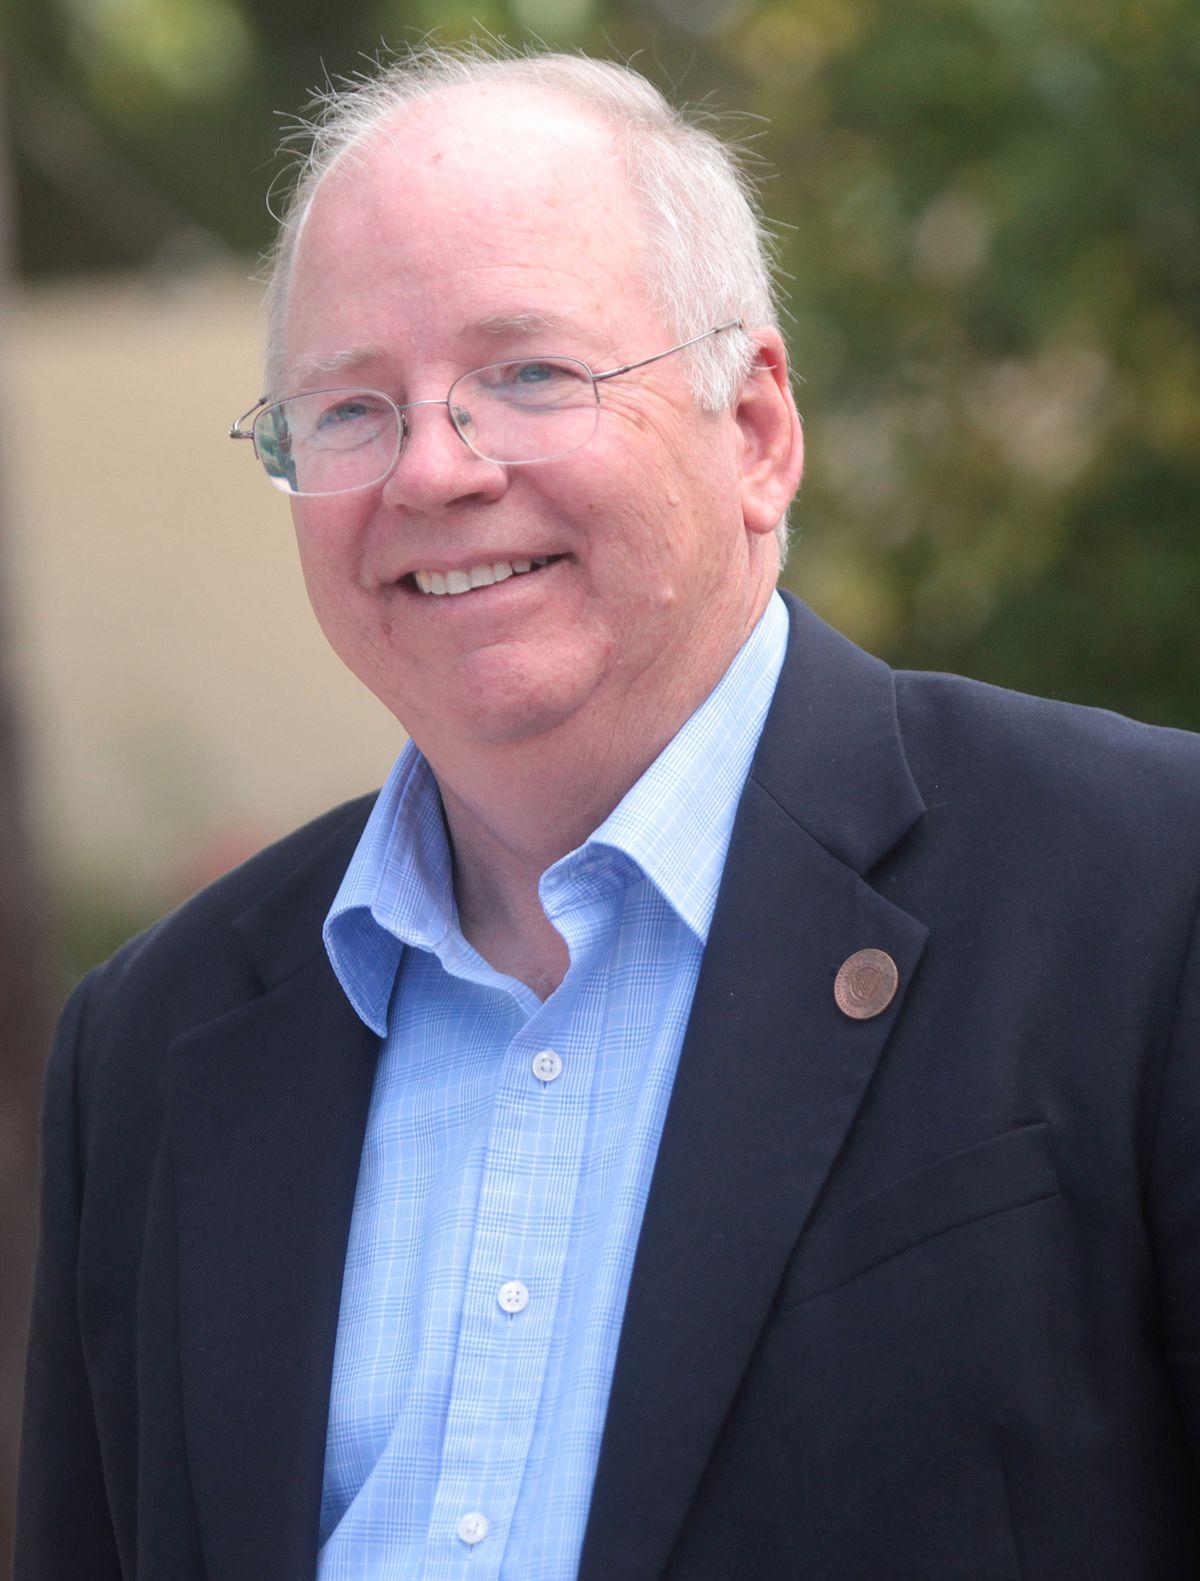 Arizona State Representatives >> Andy Tobin - Wikipedia